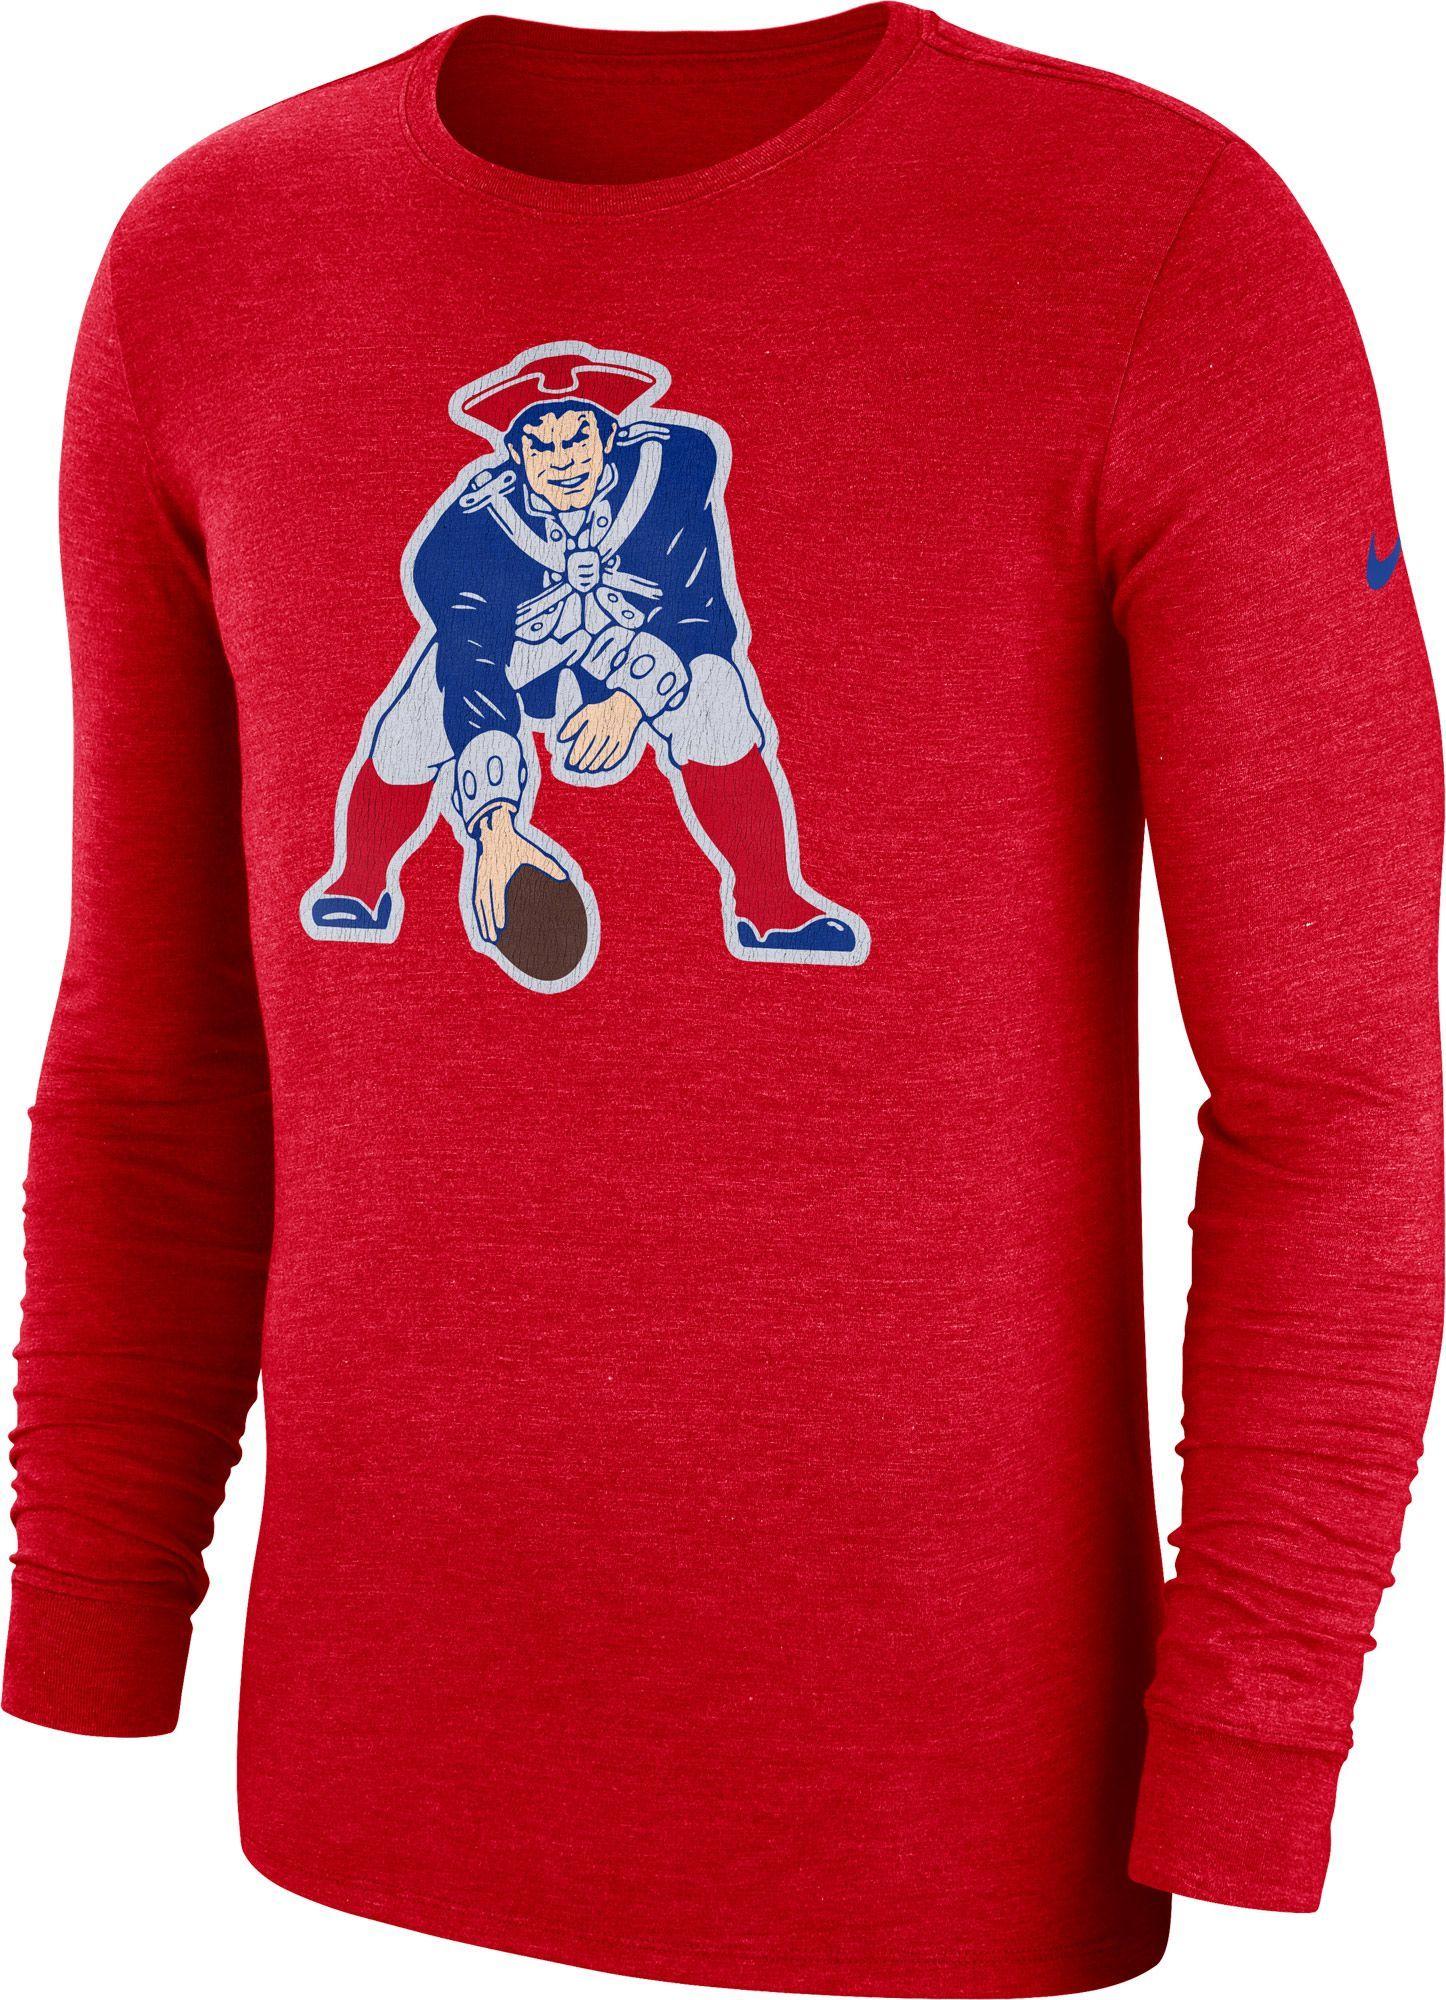 Nike Men s New England Tri-Blend Historic Crackle Red Long Sleeve Shirt c08c520ba